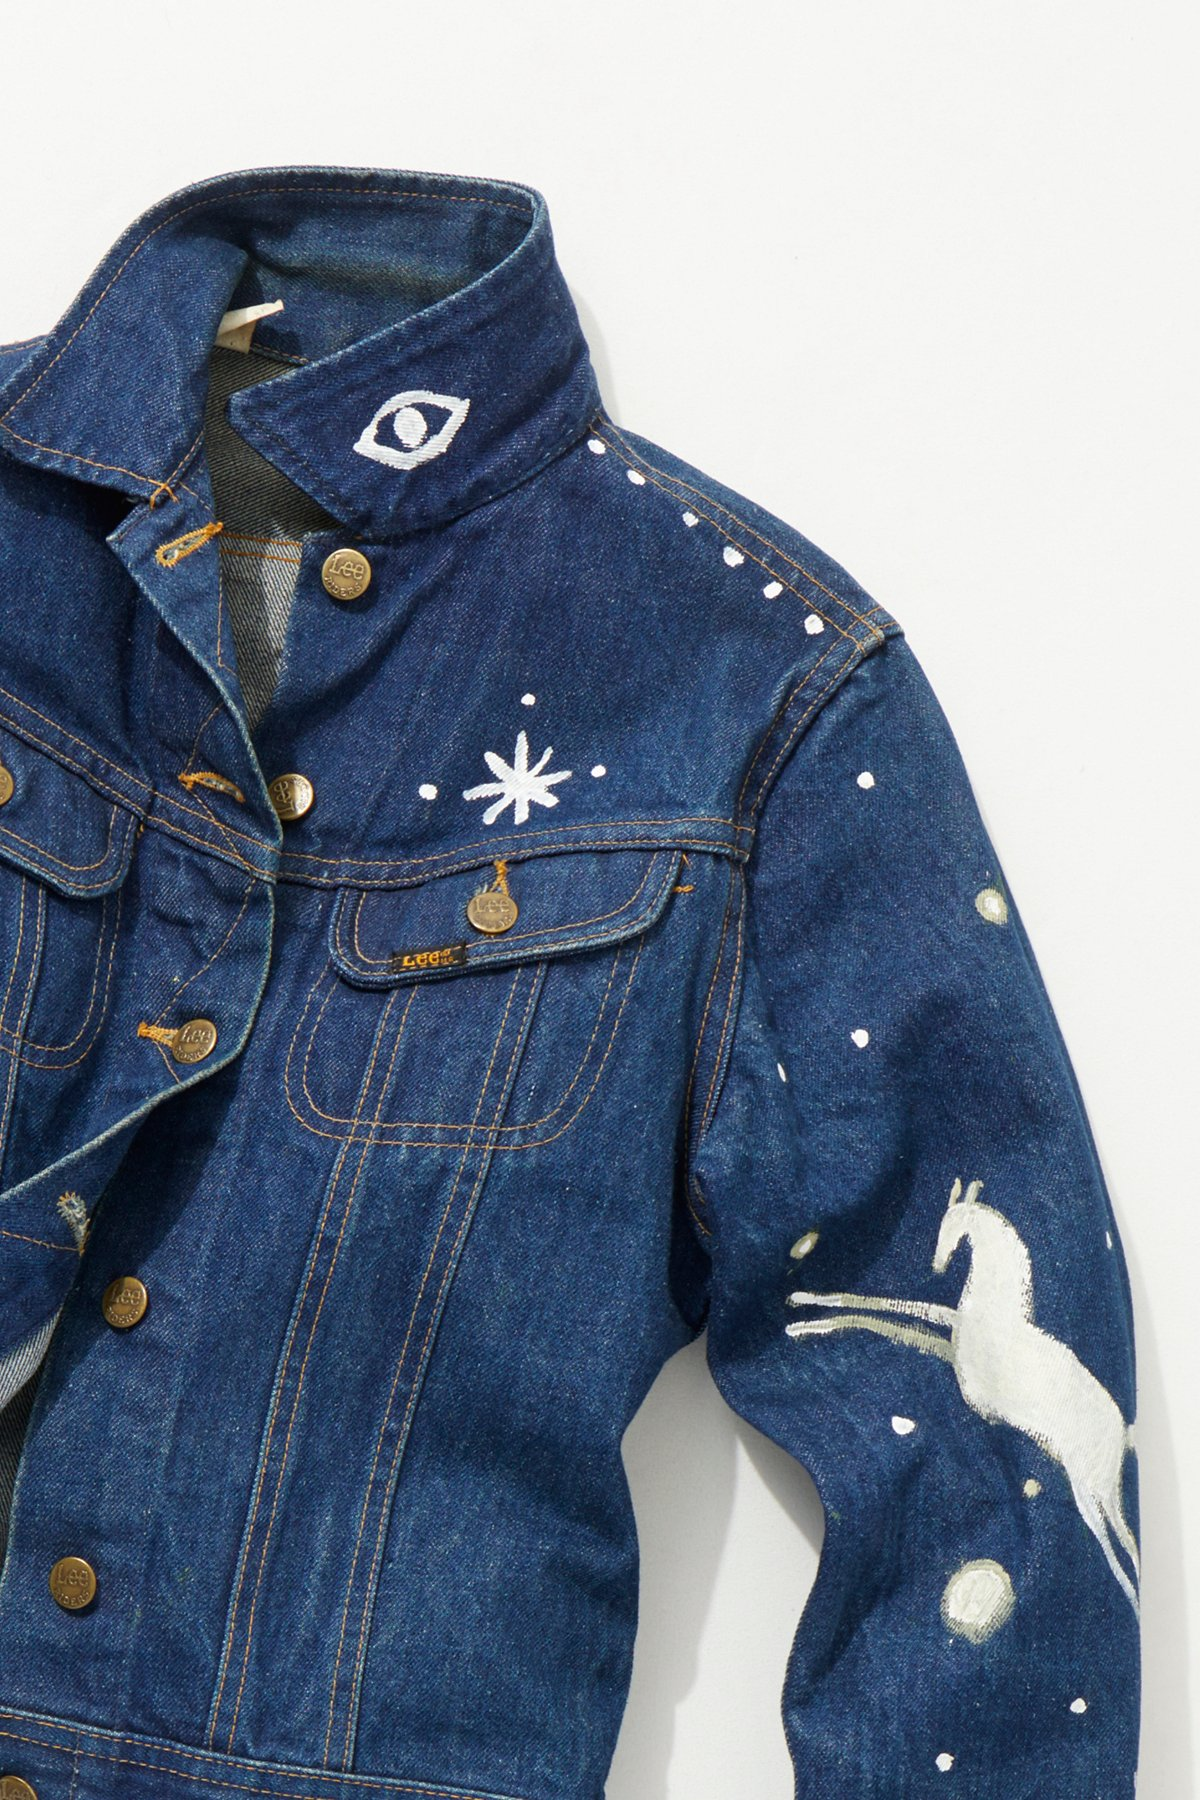 Vintage 1970s Hand Painted Denim Jacket